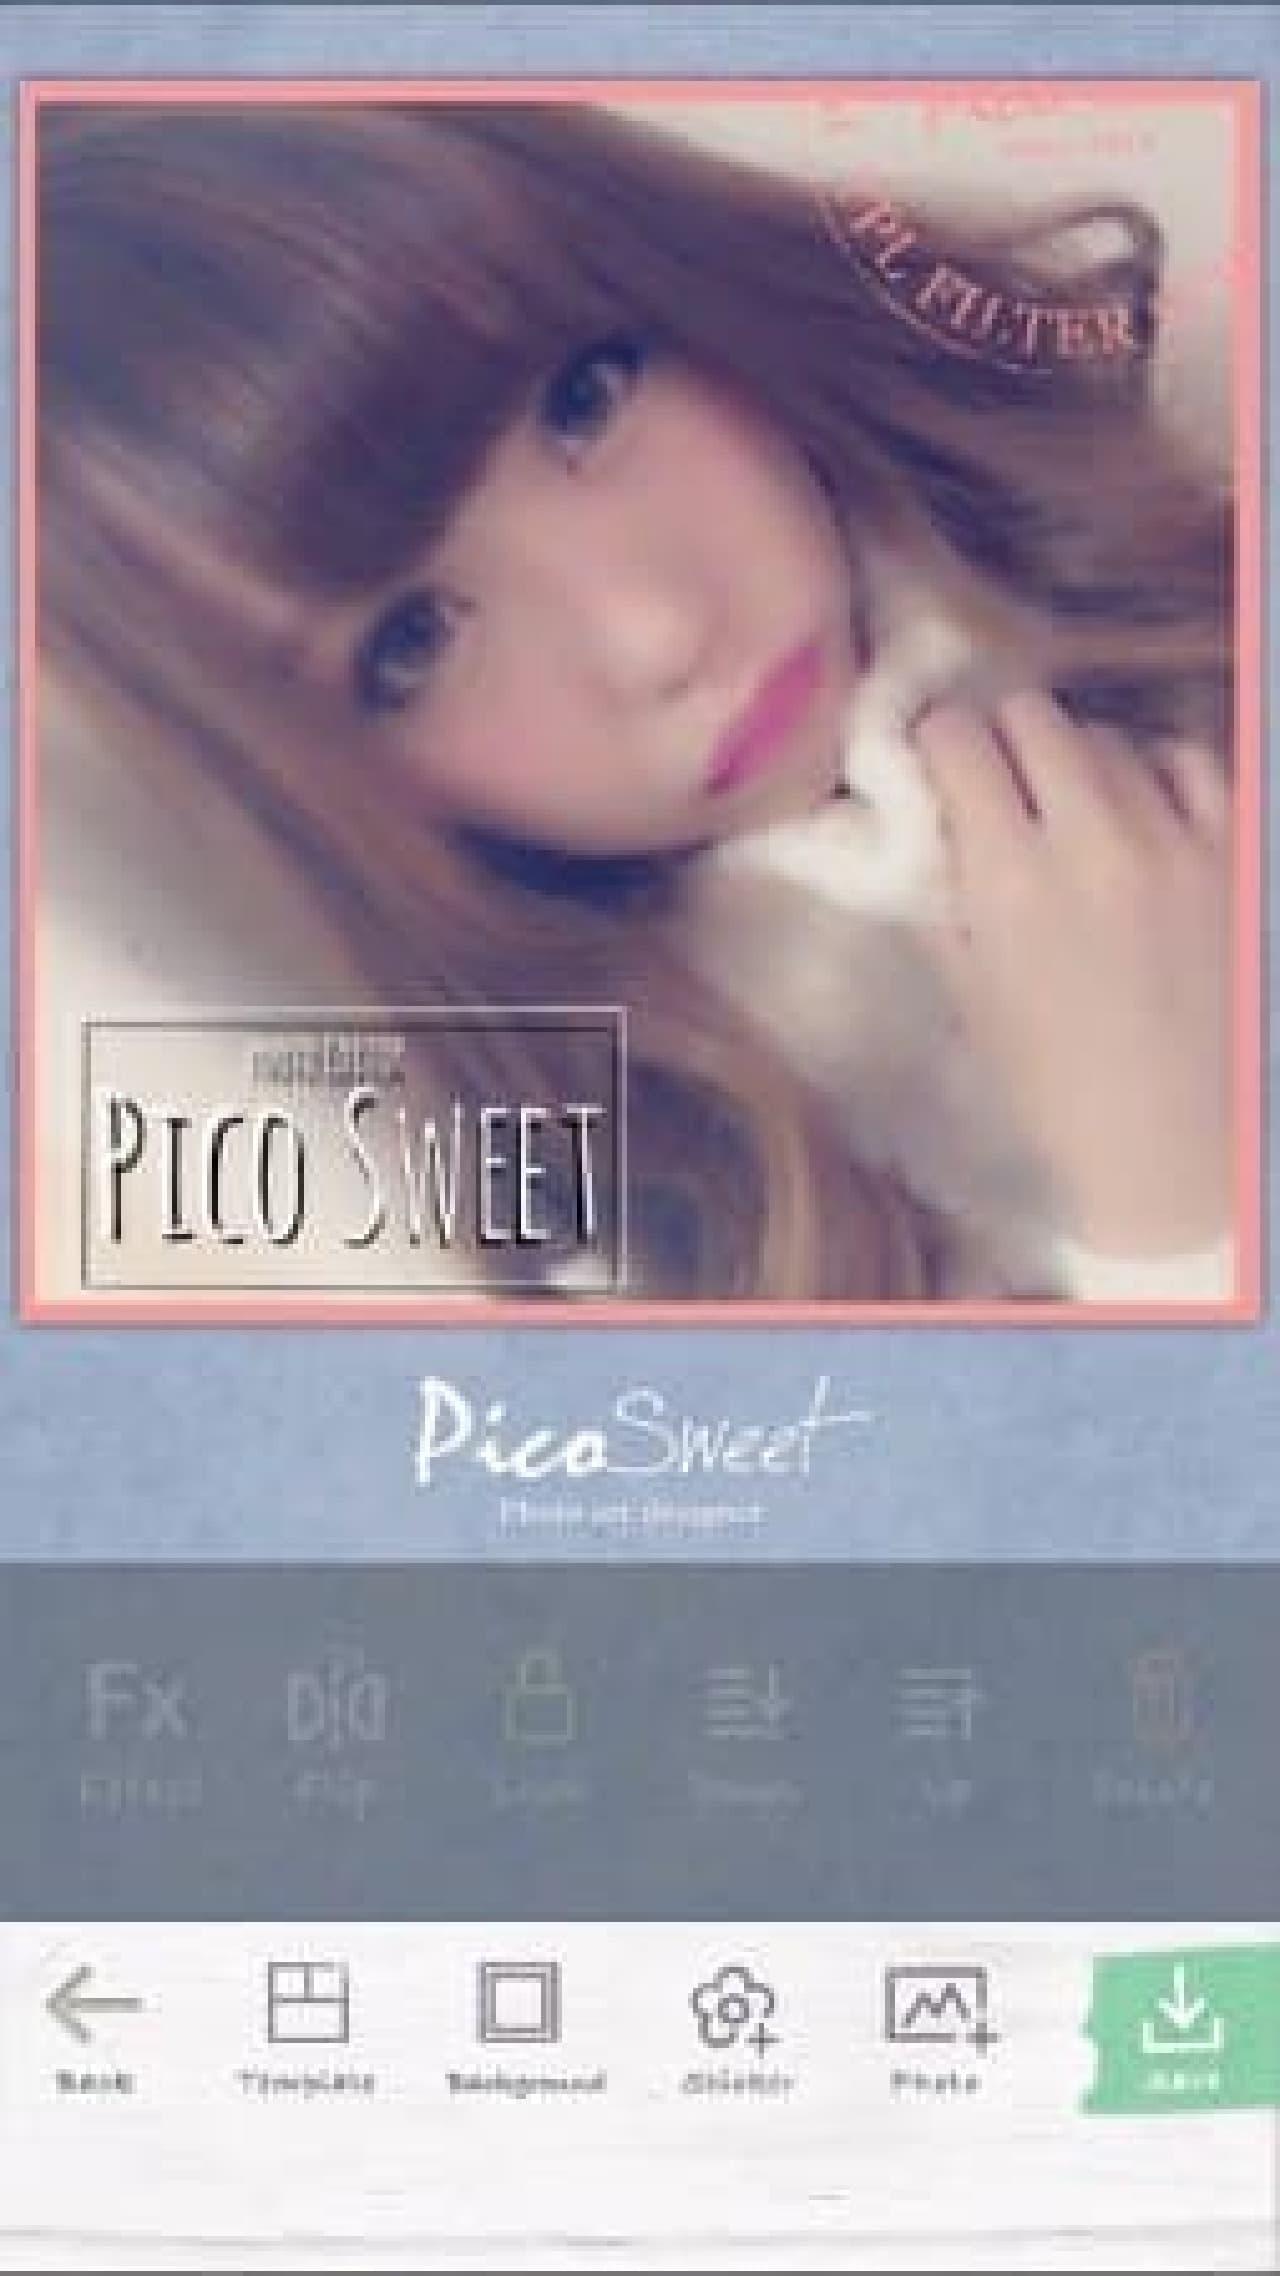 Pico Sweetで加工して、ロゴスタンプをつける